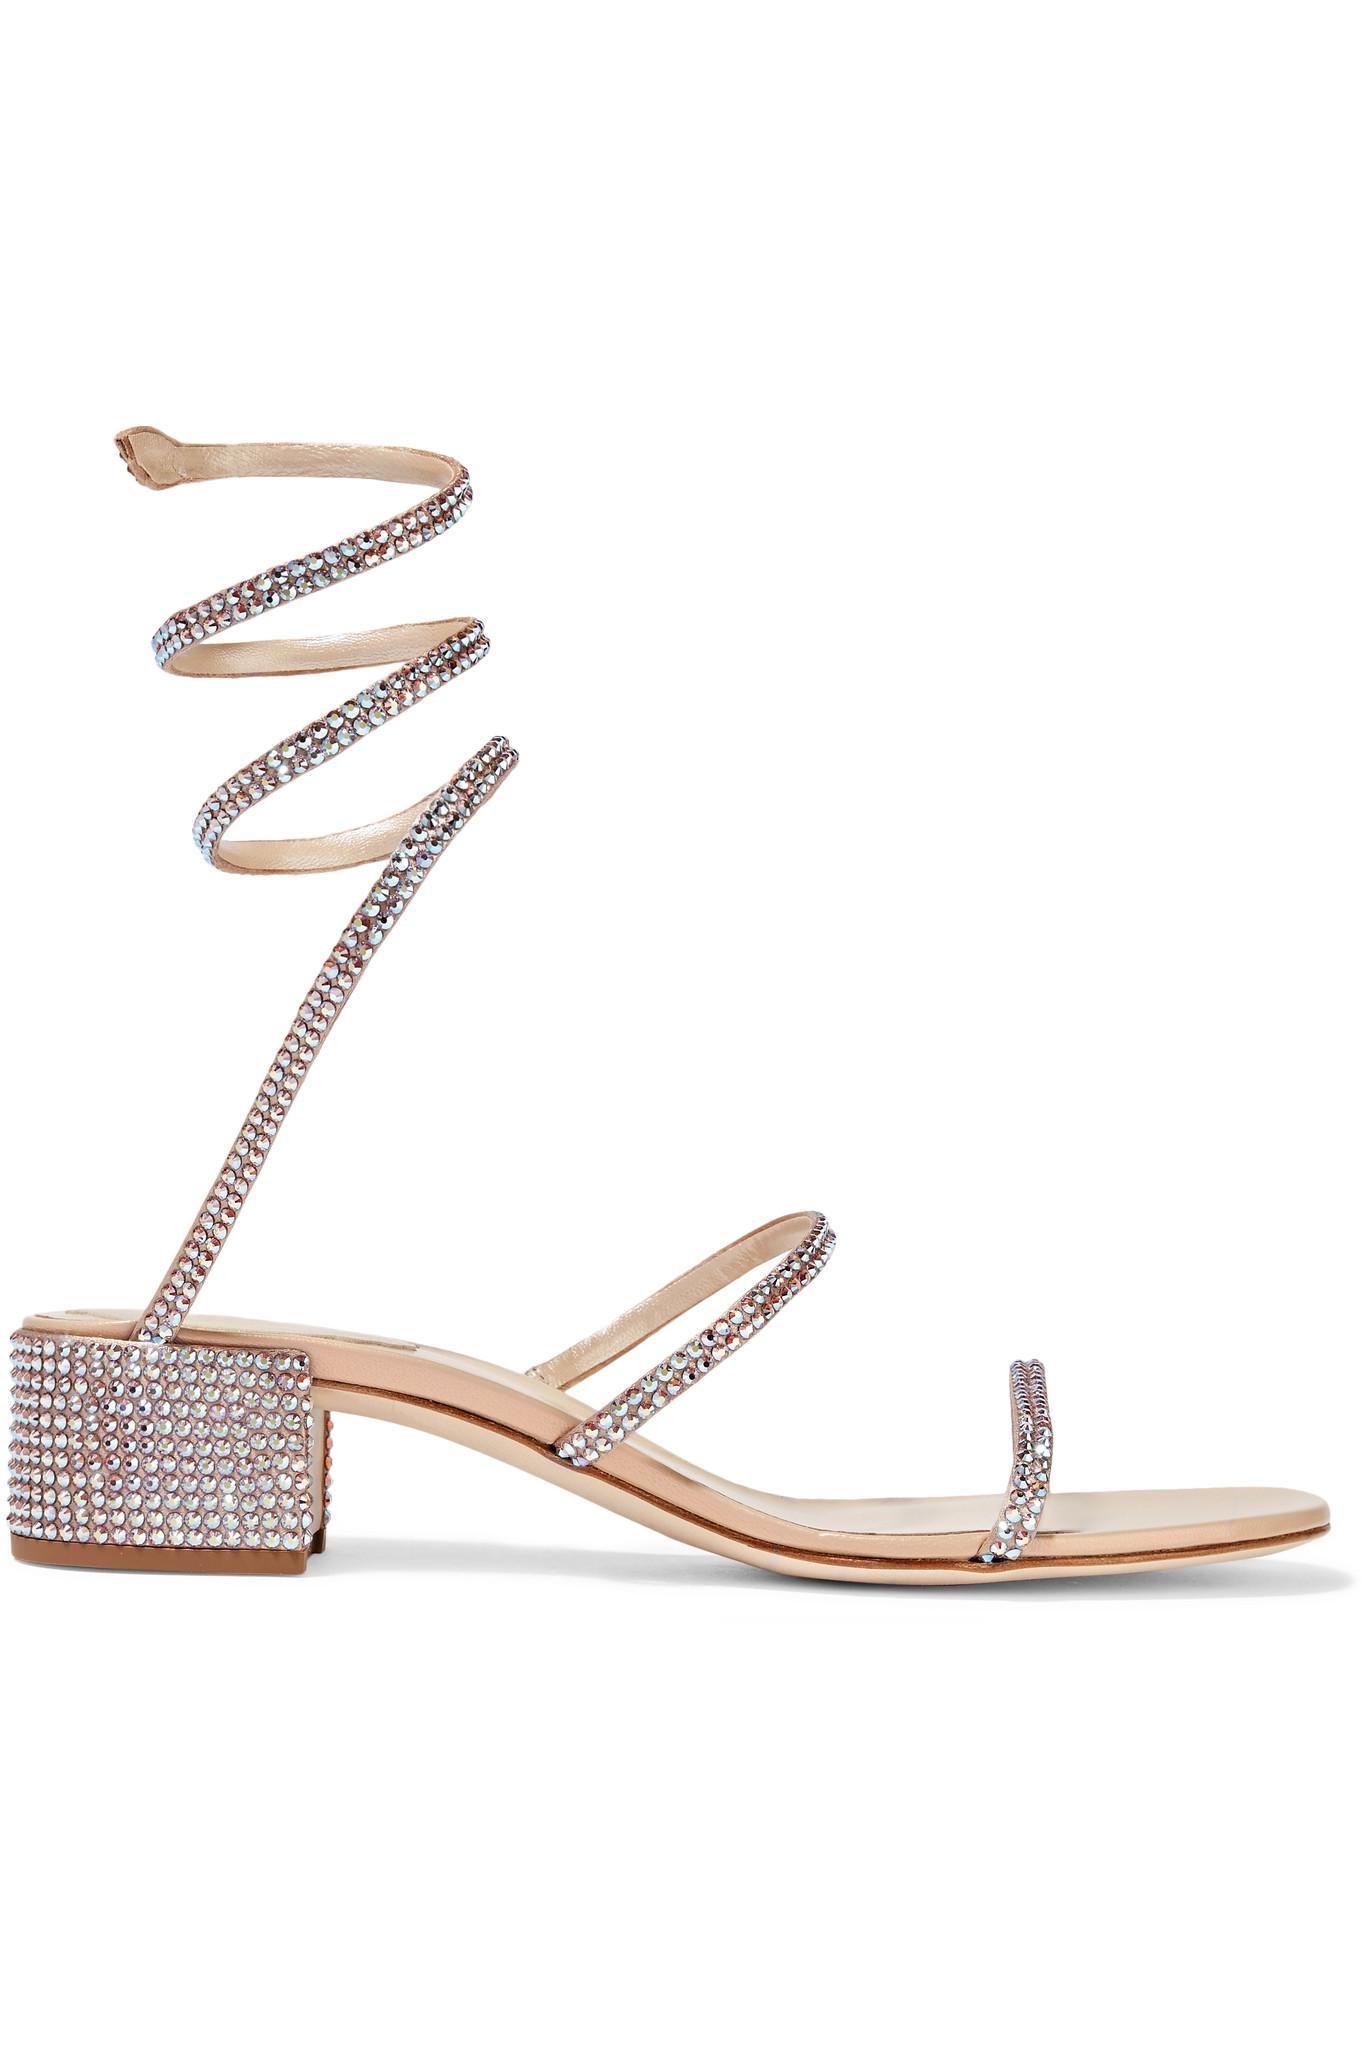 a5c297d979a22 Rene Caovilla. Women s Natural Cleo Crystal-embellished Satin Sandals